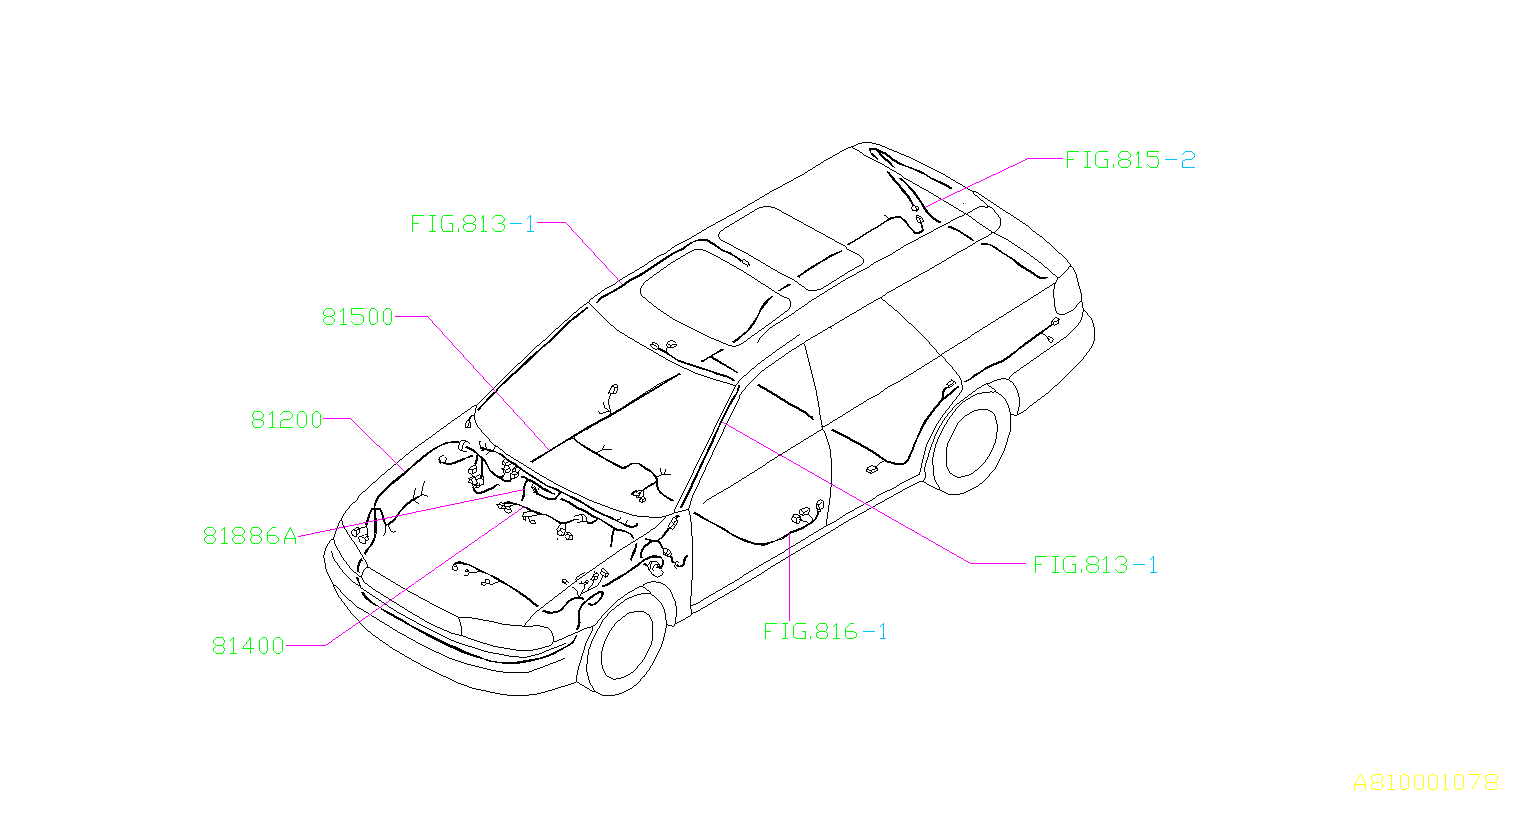 Subaru Legacy Harness Bulkhead U0u1 Main Wiring